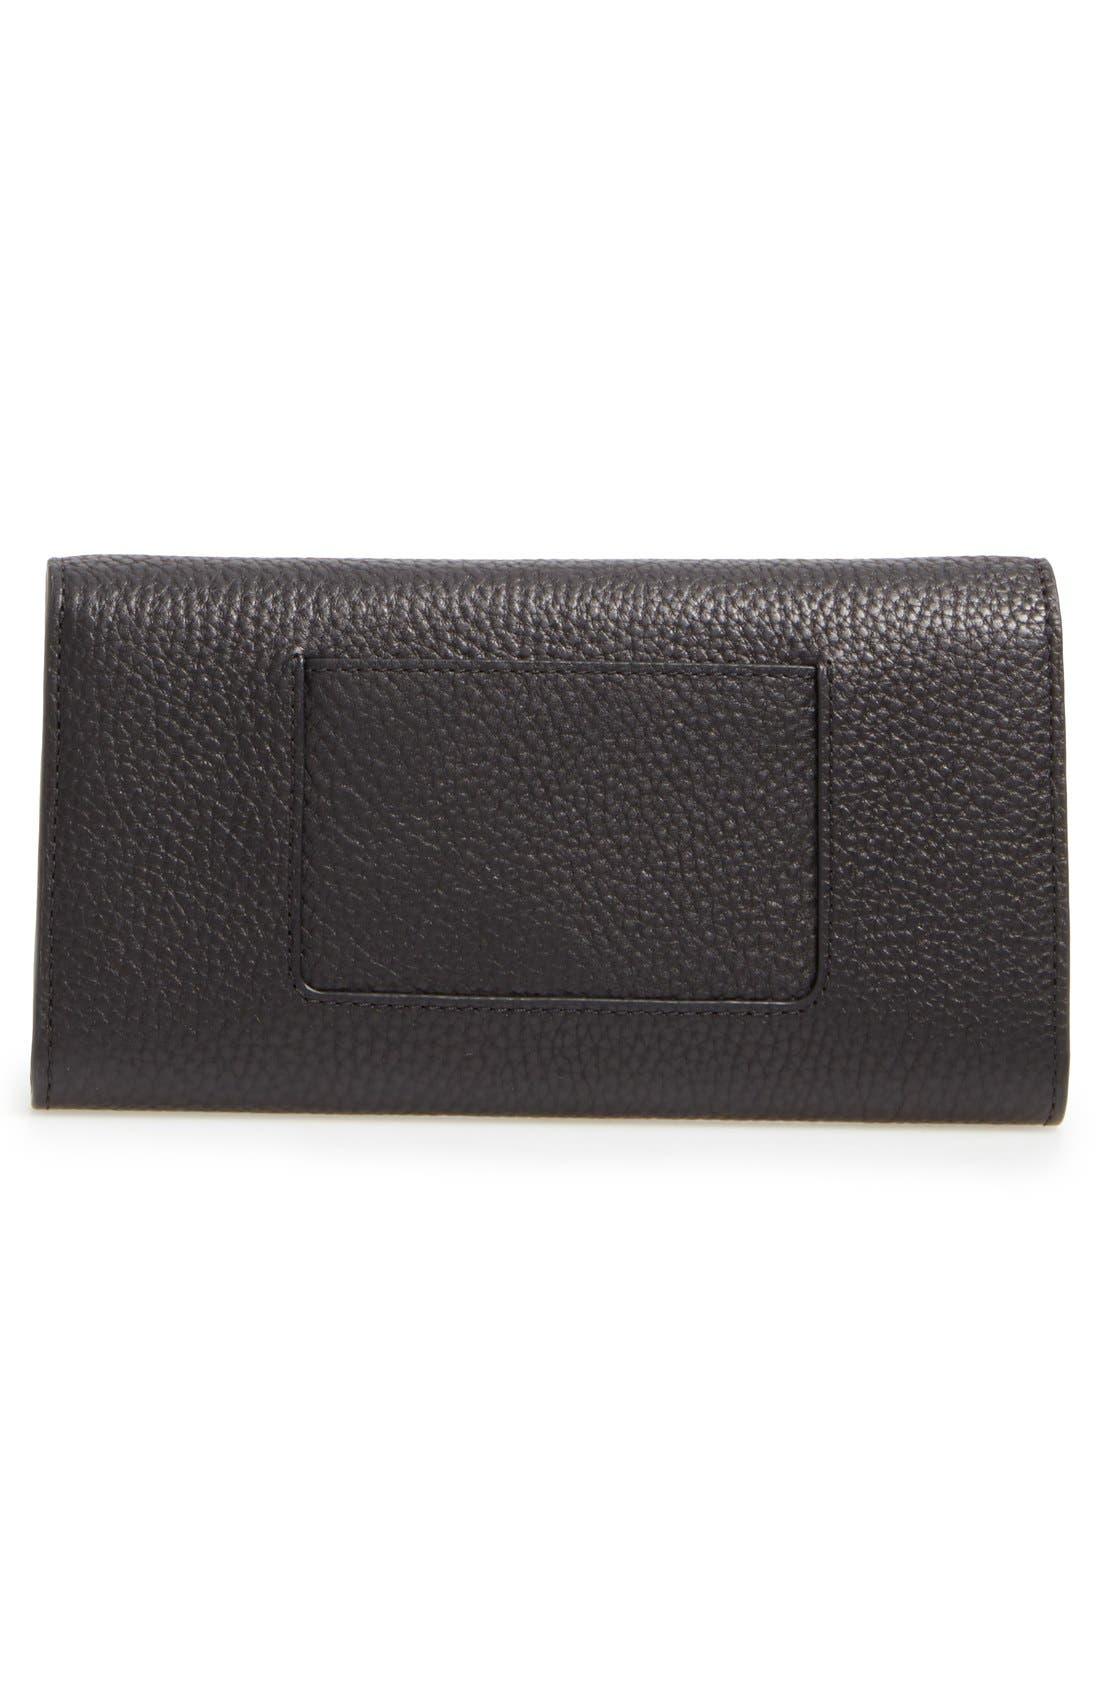 'Postman's Lock' Leather Wallet,                             Alternate thumbnail 2, color,                             BLACK